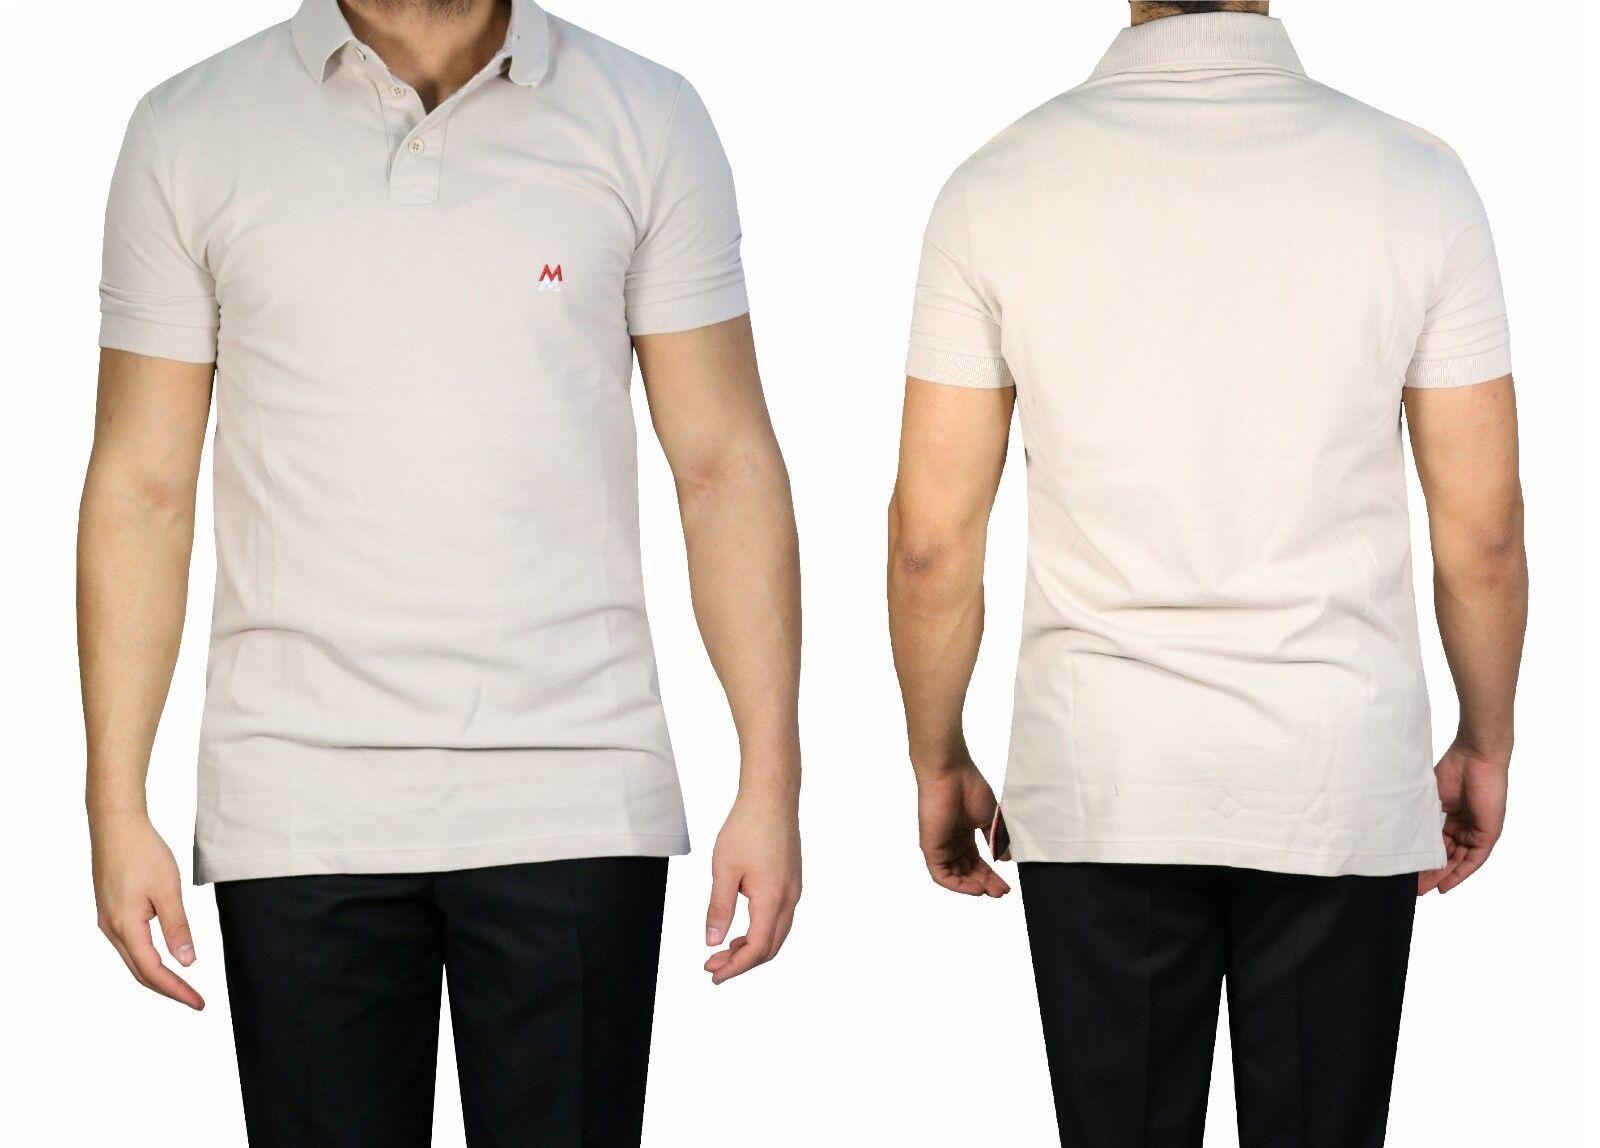 Muga Slim-fit Herren Herren Herren Poloshirt Gr.4XL Beige | Sale Outlet  | Hochwertige Materialien  cc3977